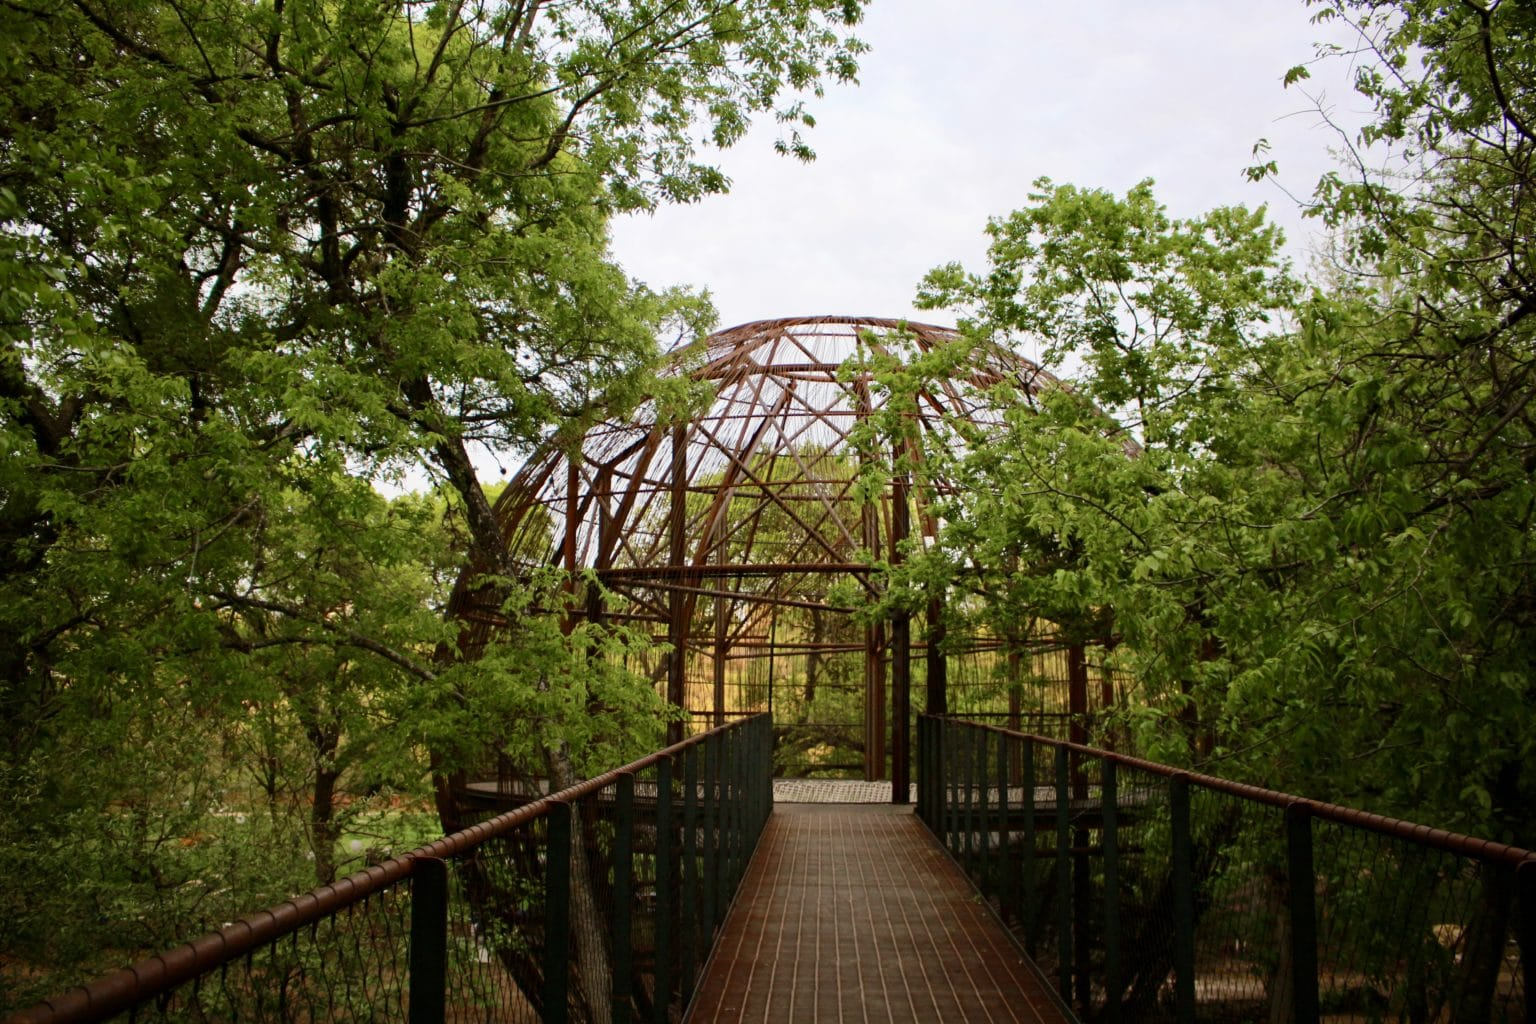 pease park renovation